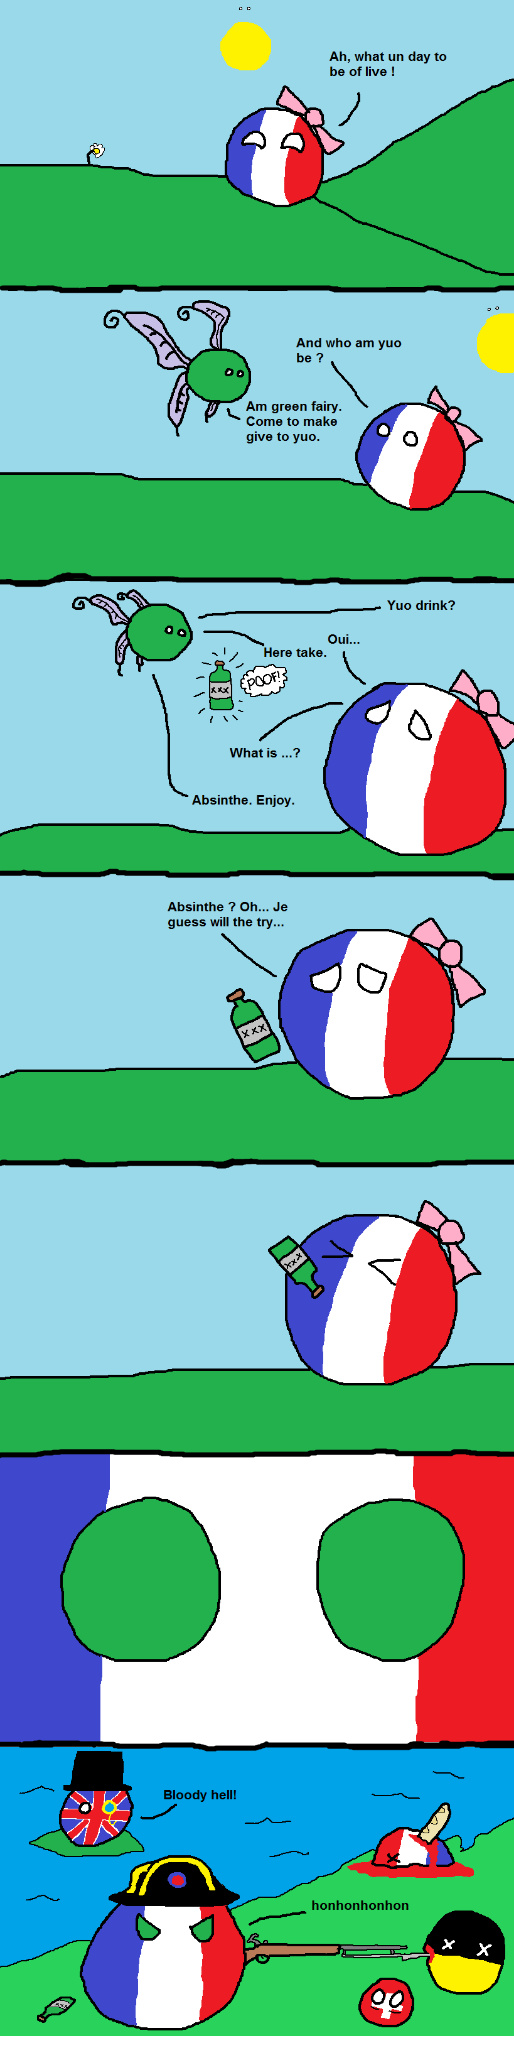 Google Polandball comics for more - meme